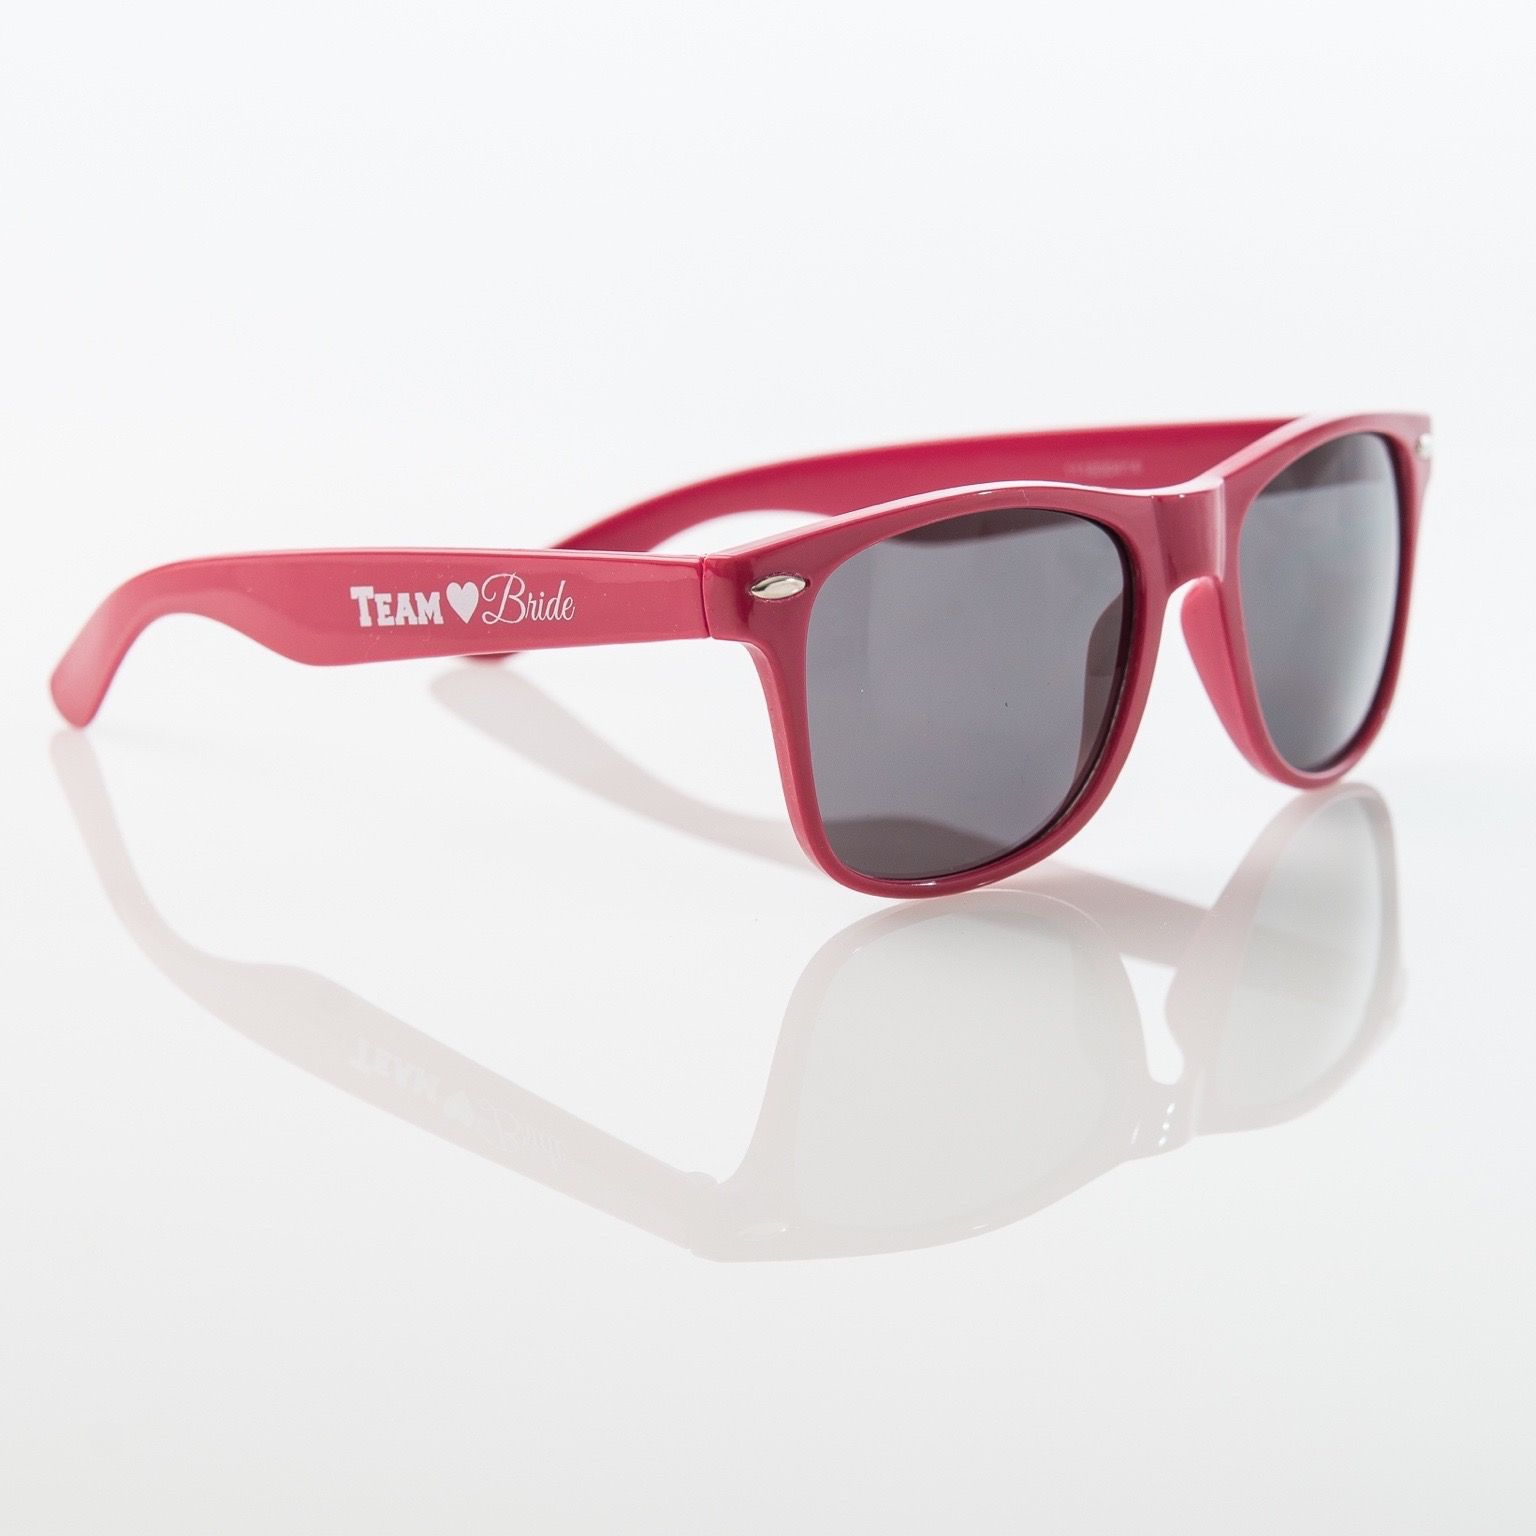 TEAM Bride sunglasses. PINK | Bridal Party Sunglasses | Pinterest ...